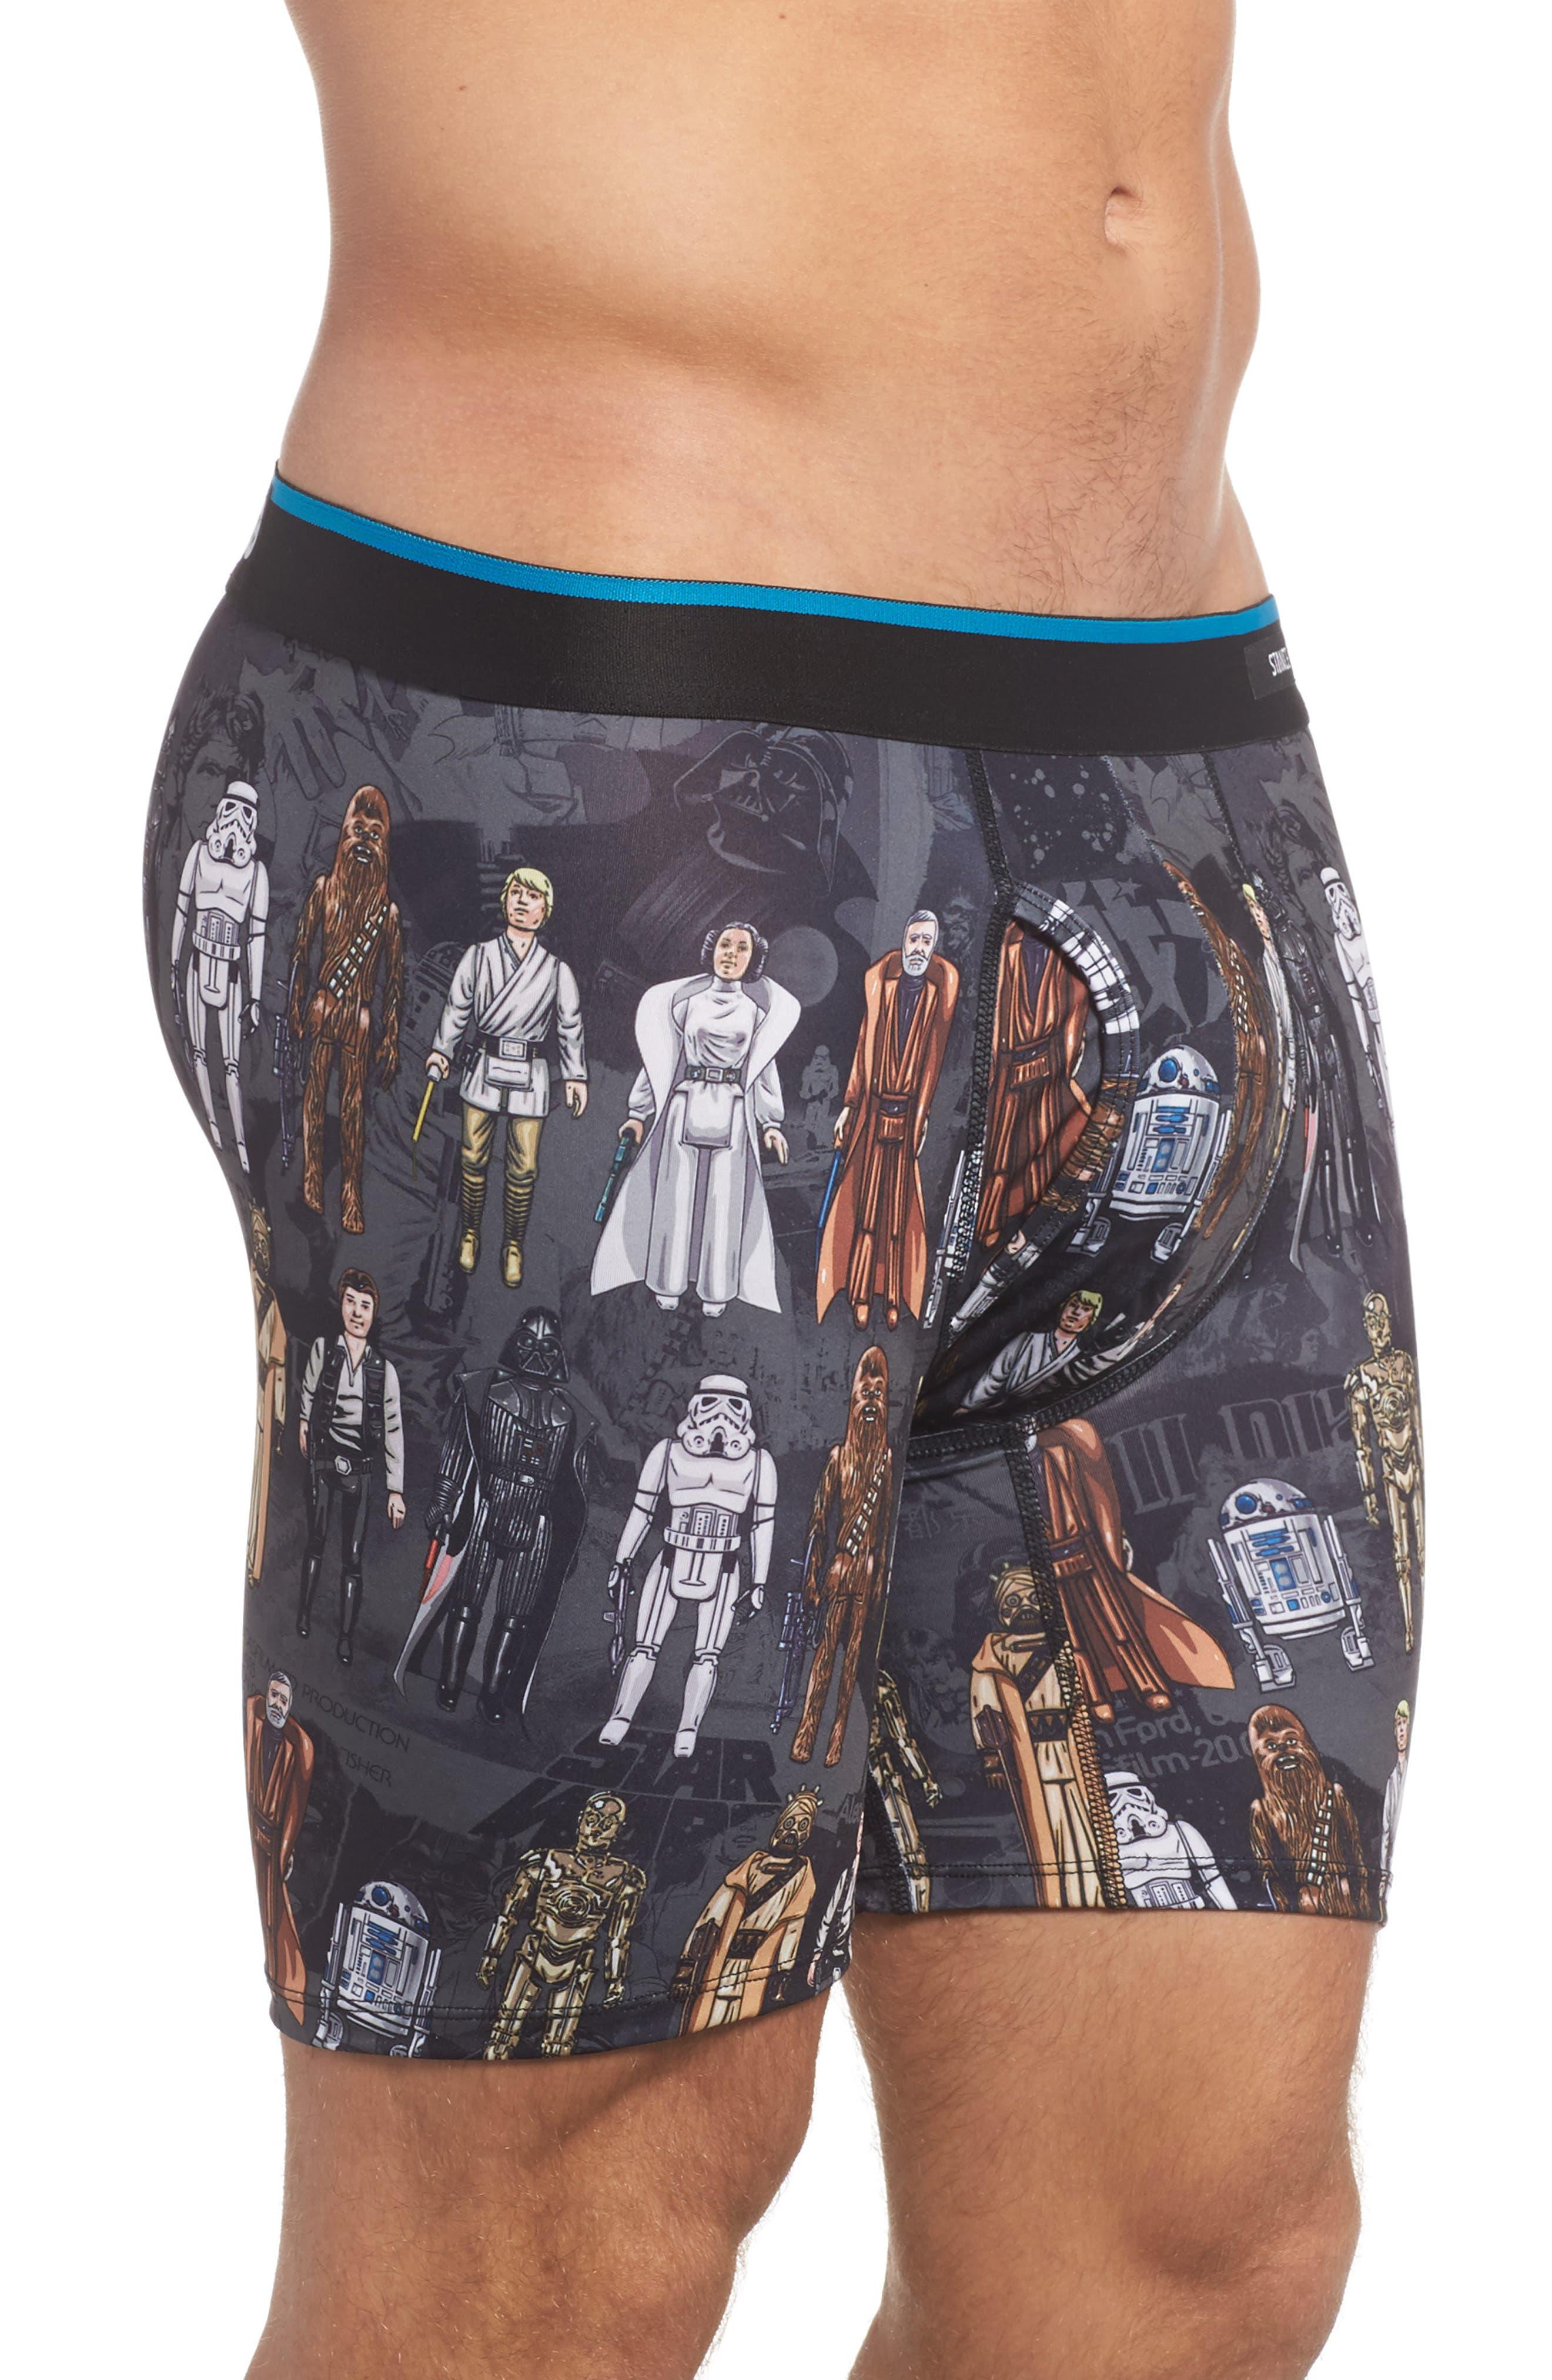 Star Wars<sup>™</sup> Boxer Briefs,                             Alternate thumbnail 3, color,                             001